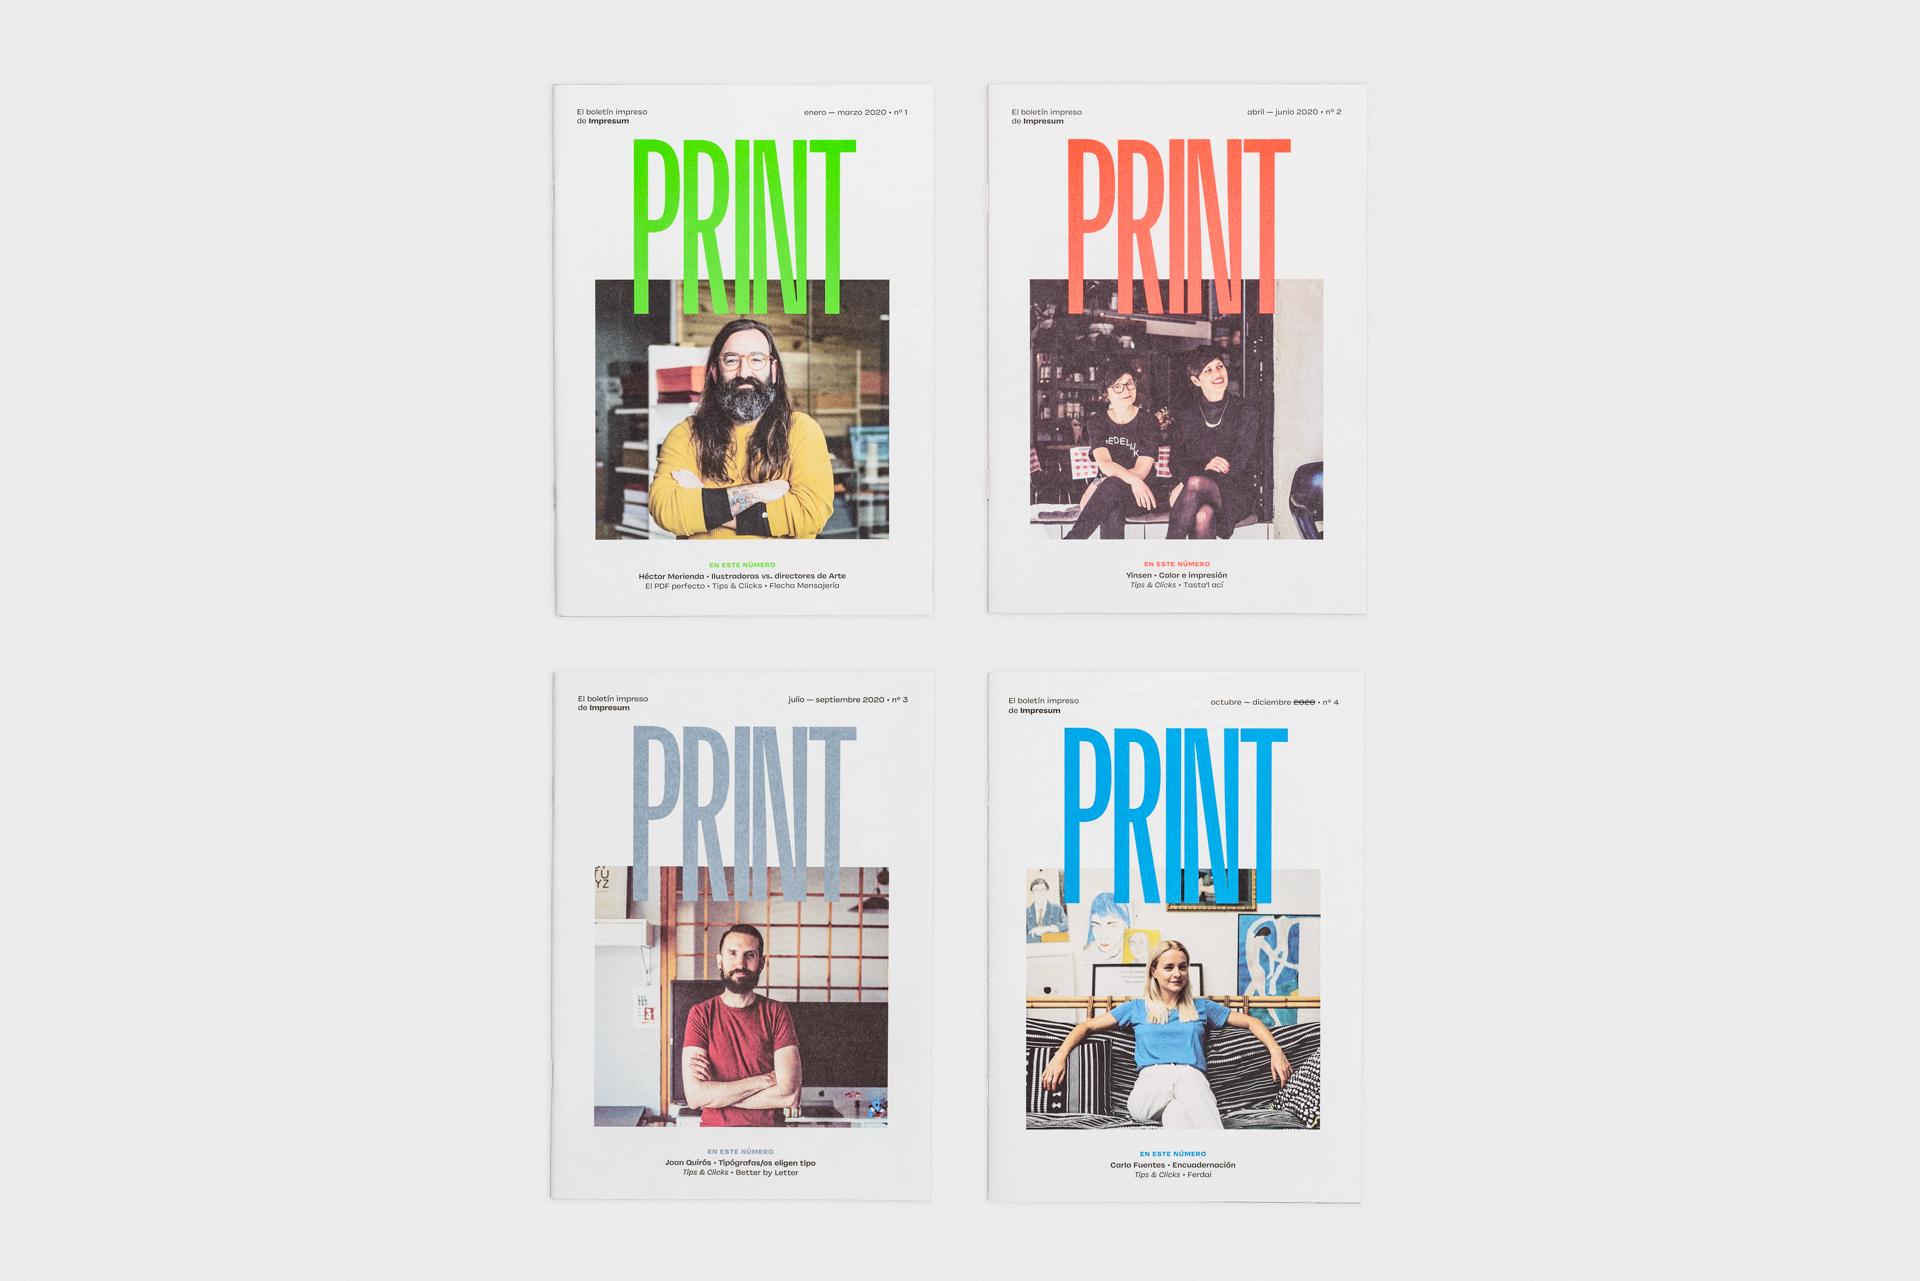 PRINT / NOPRINT